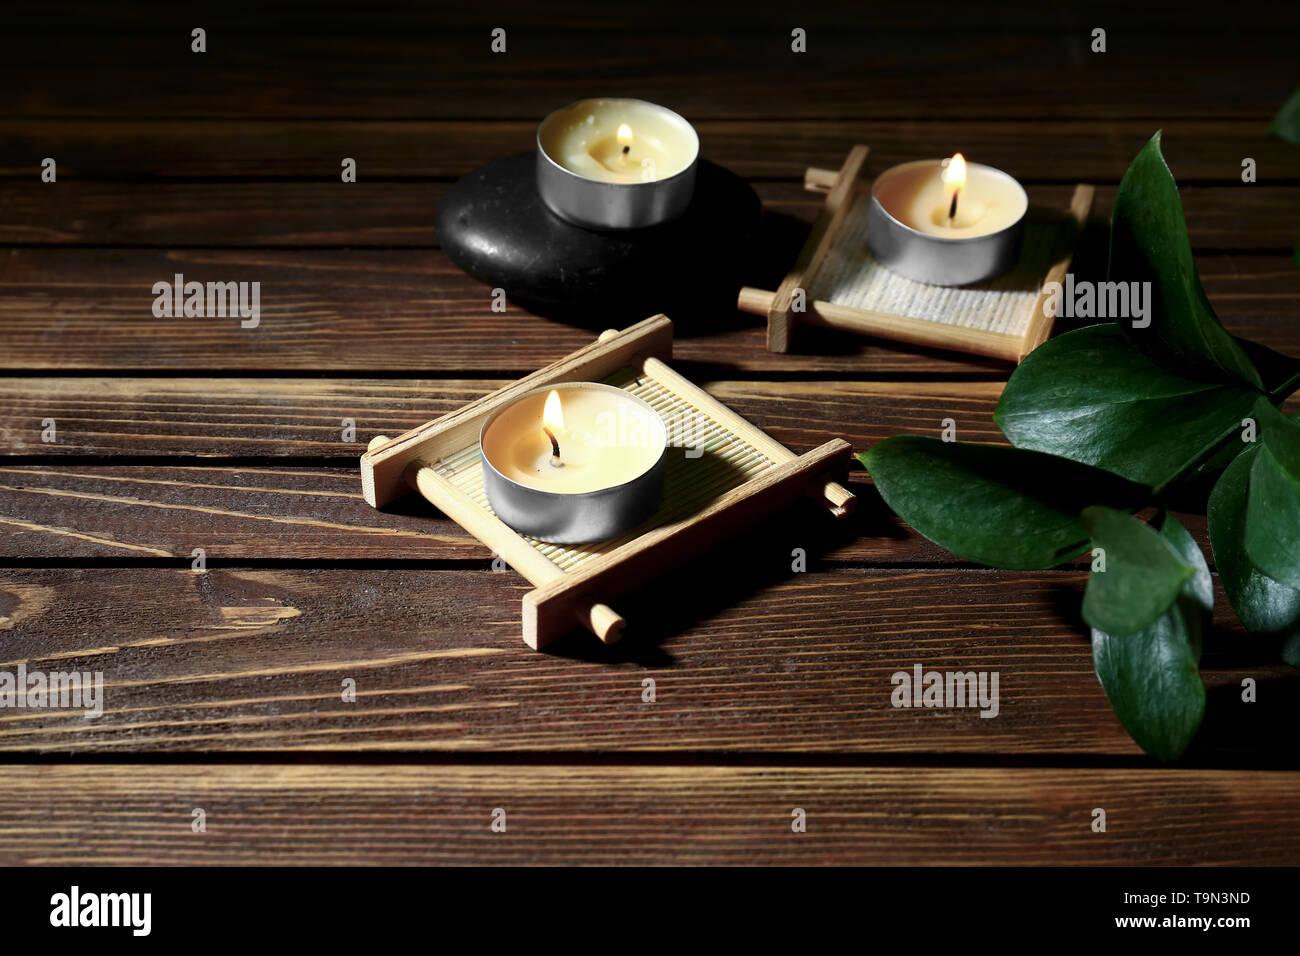 Burning candles on wooden background - Stock Image